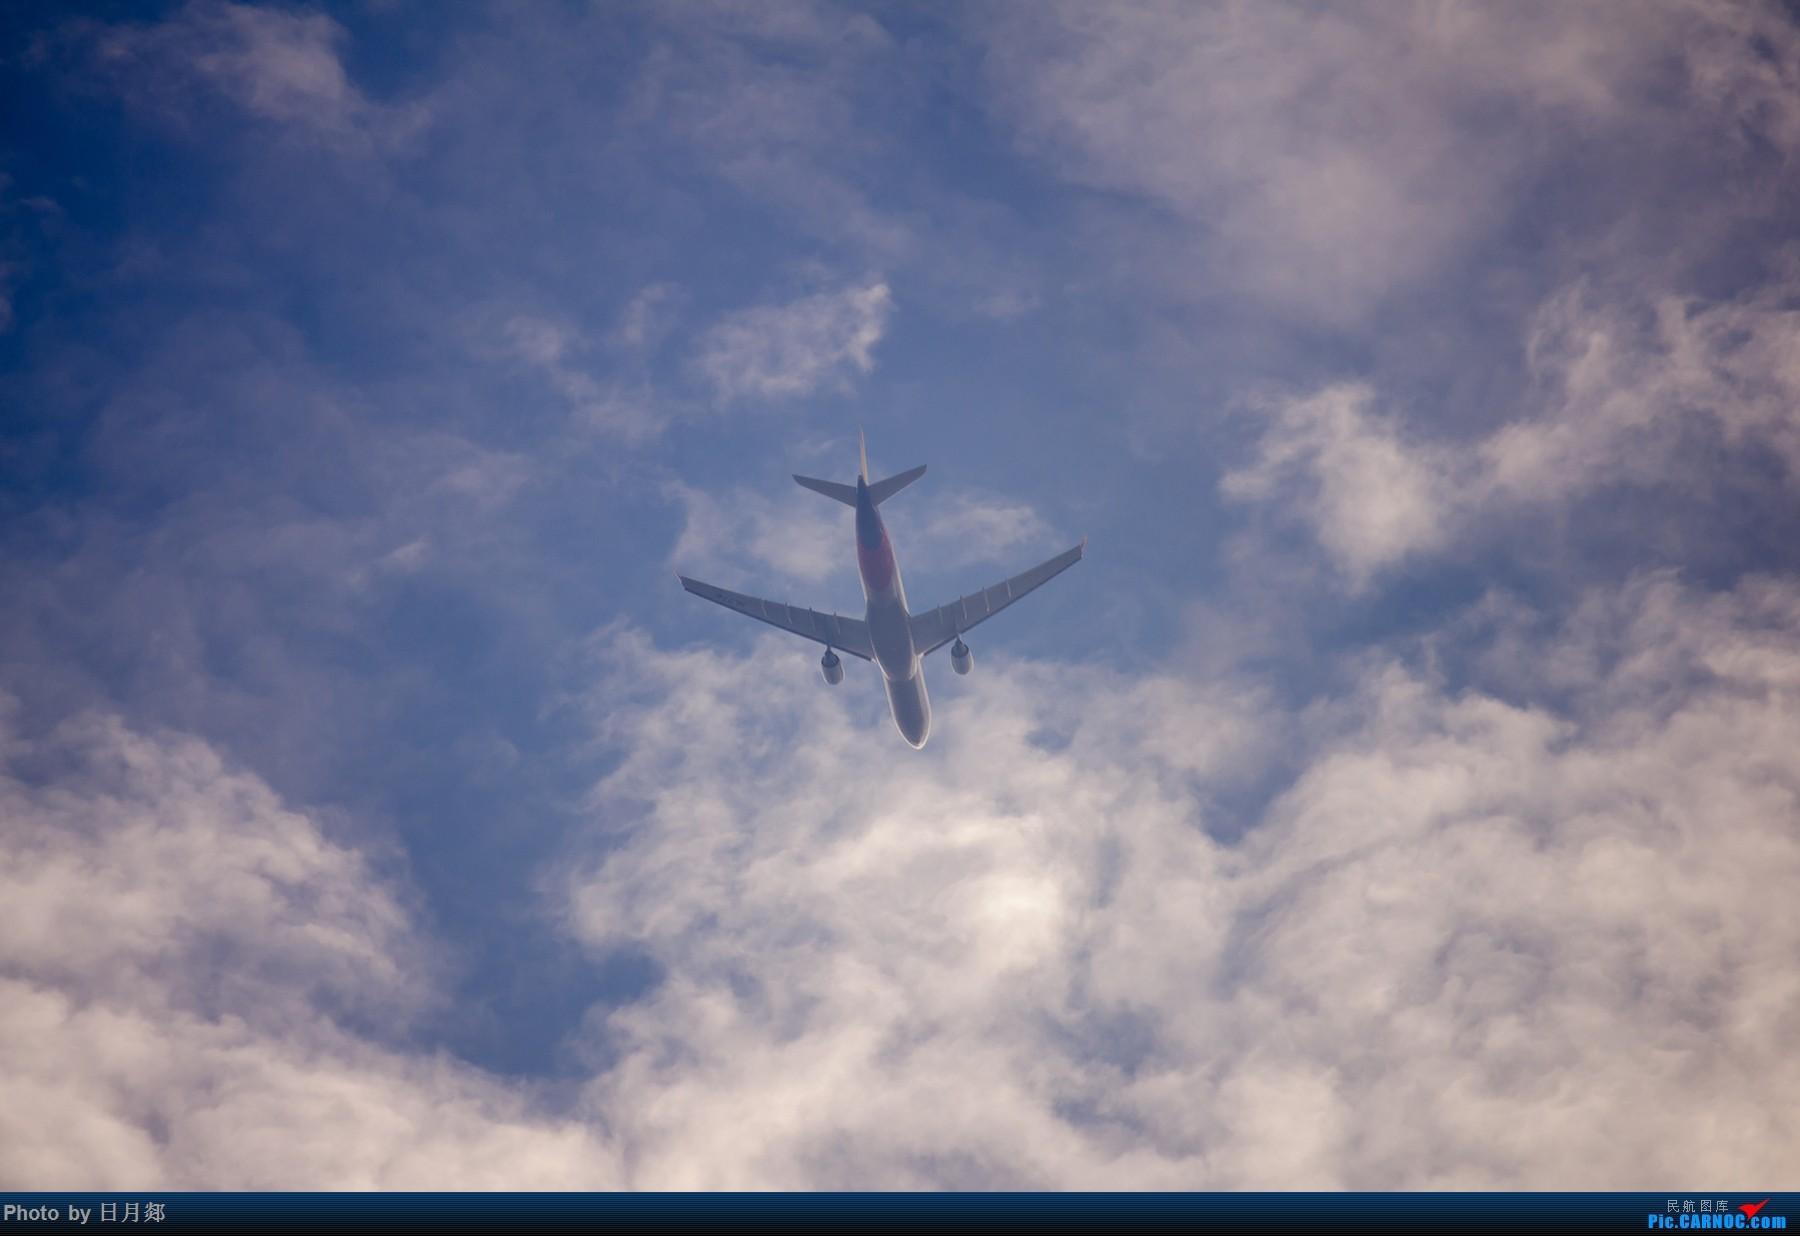 Re:[原创]【SHA拍机*1800大图】国庆的存货接着发,台风啥时候才能过去 AIRBUS A330-300  中国上海虹桥国际机场